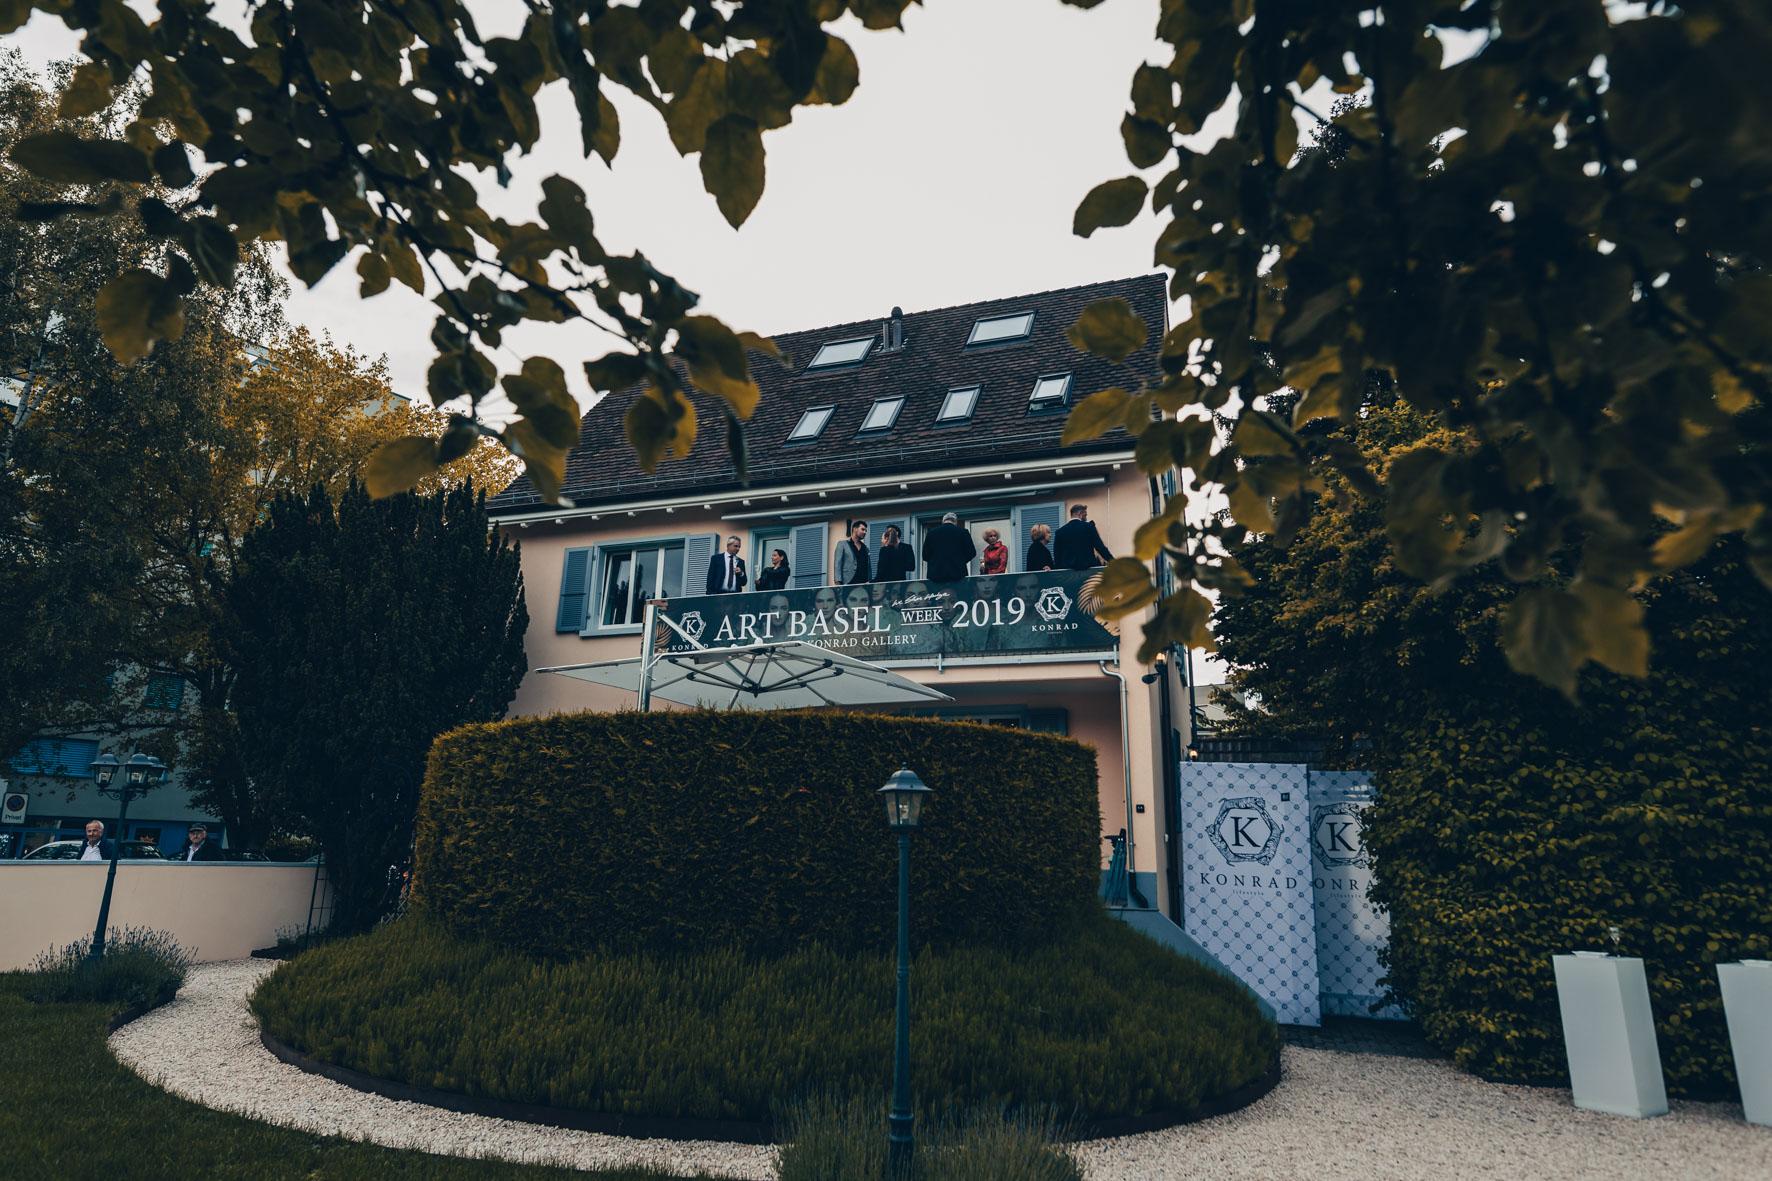 Konrad-lifestyle-art-basel-%22c.f.bucherer%22-2019-58.jpg